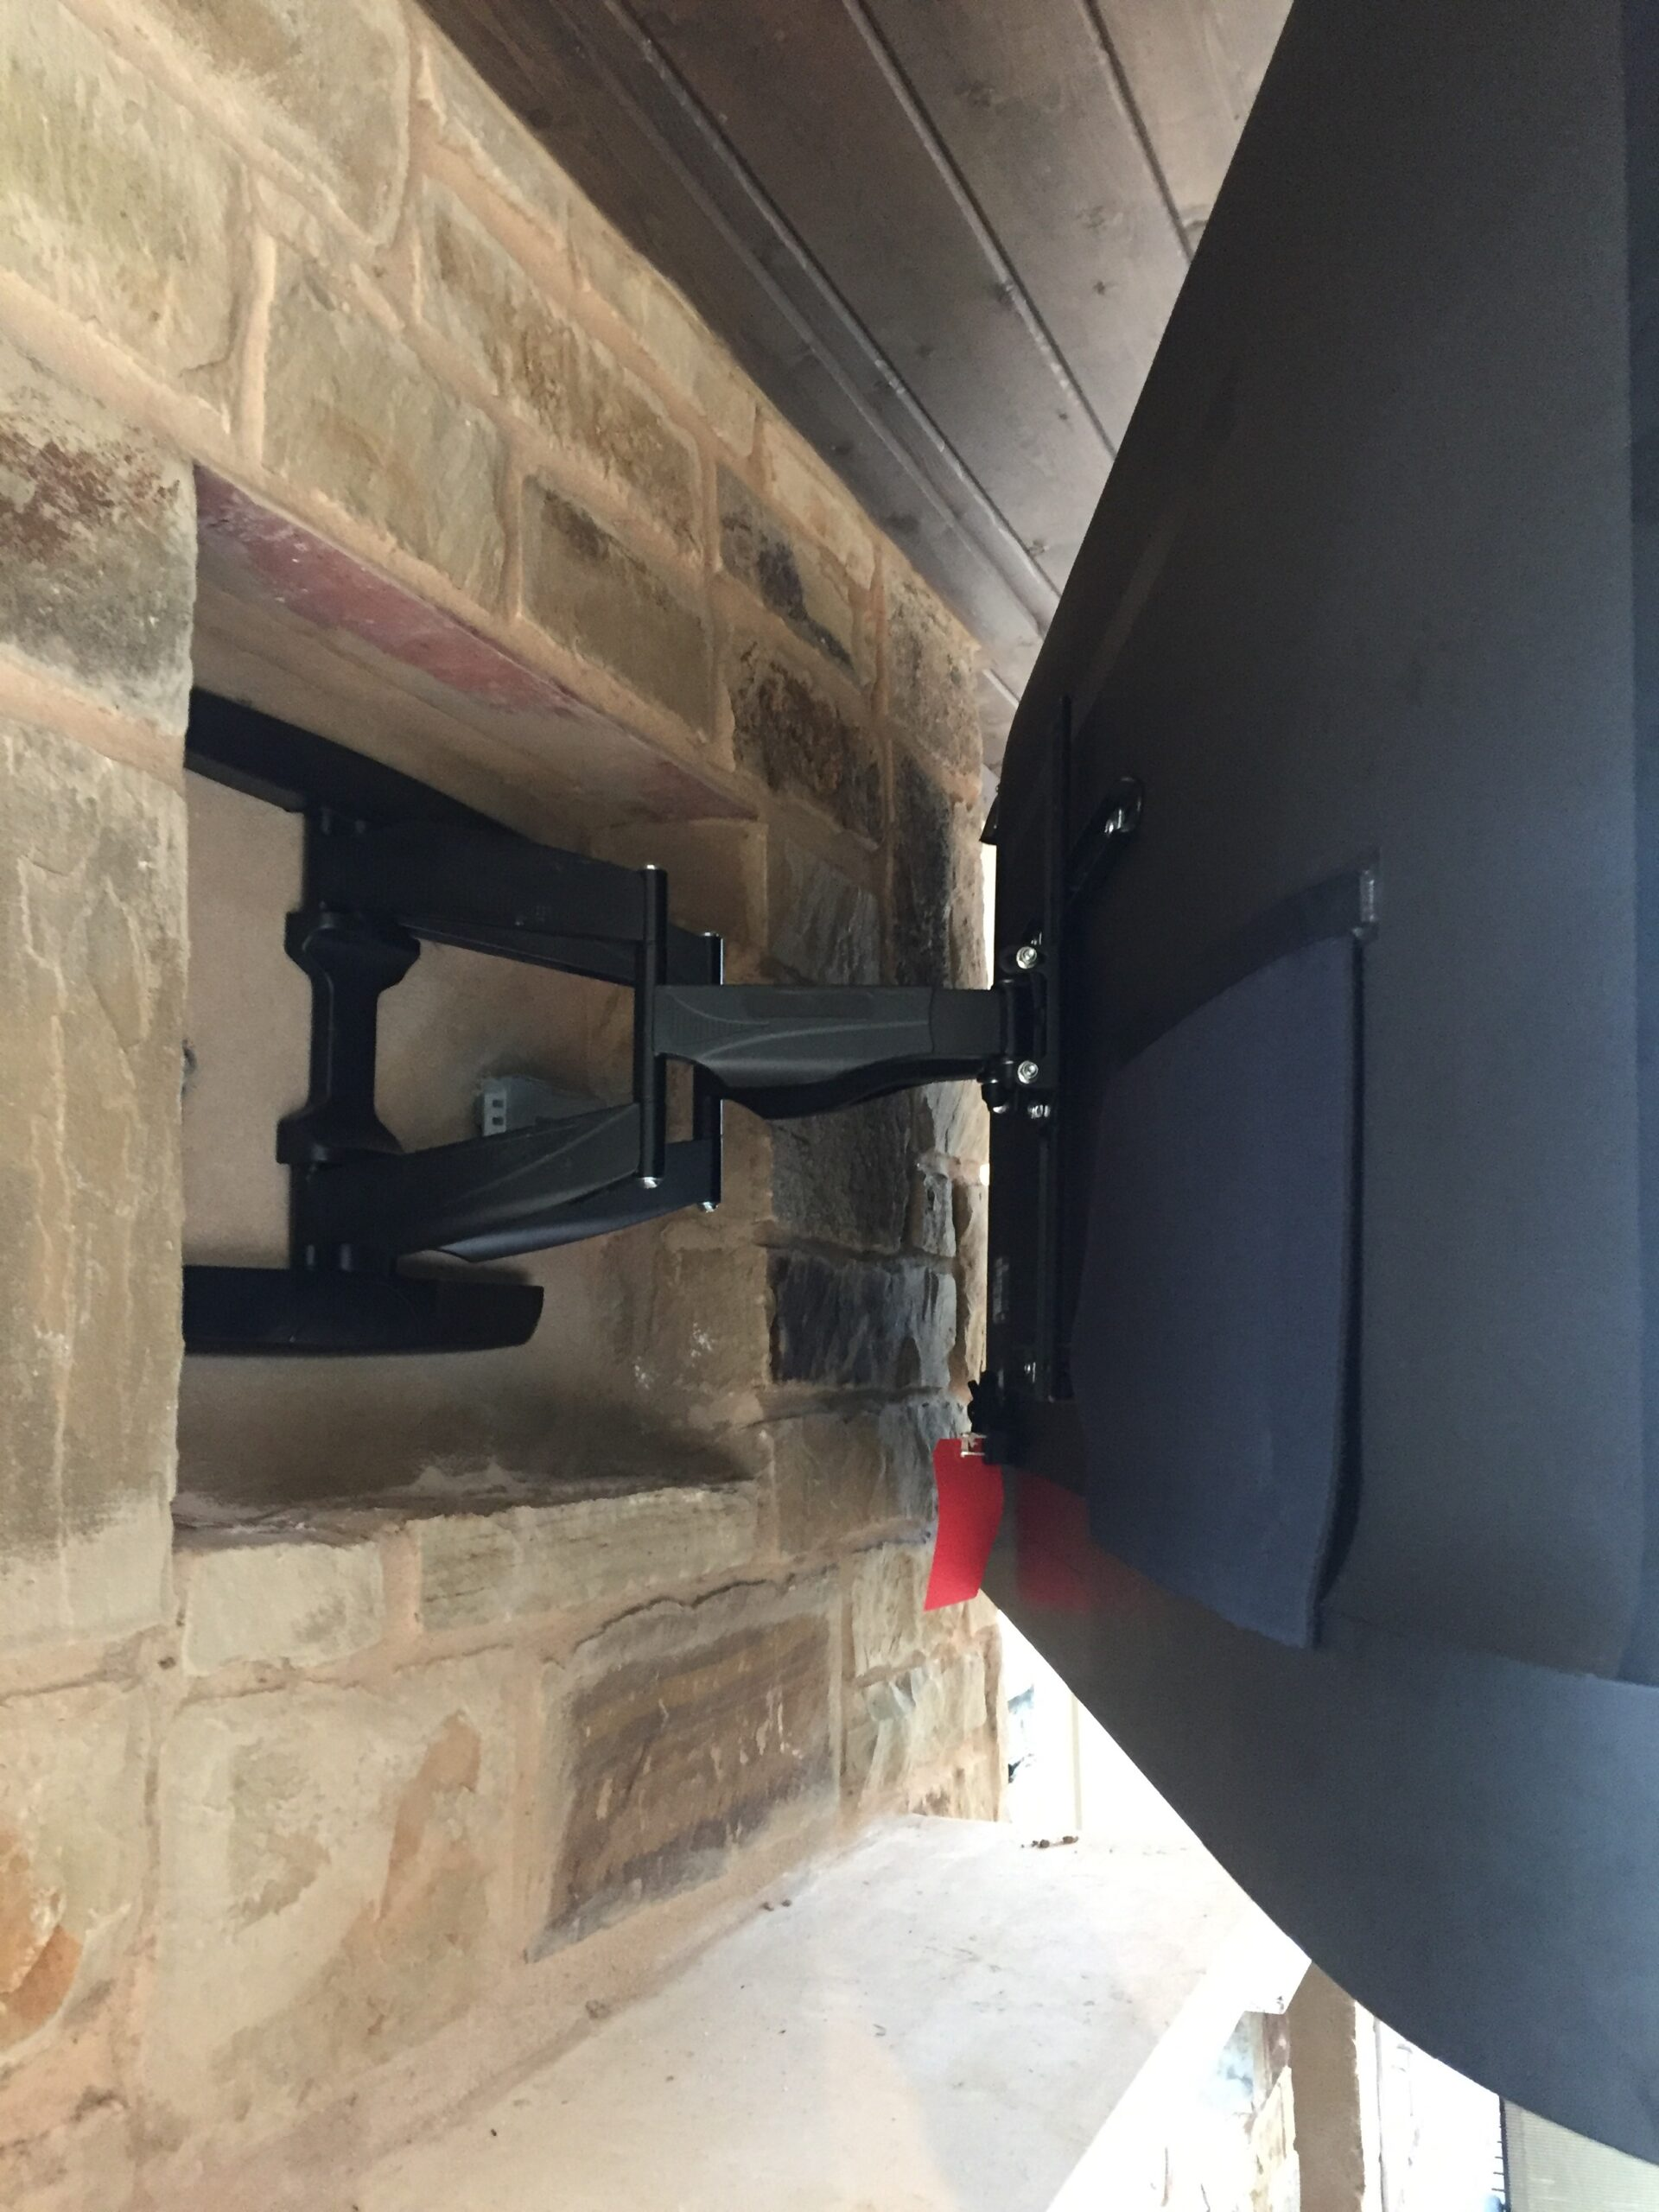 Outdoor TV installed into brick siding